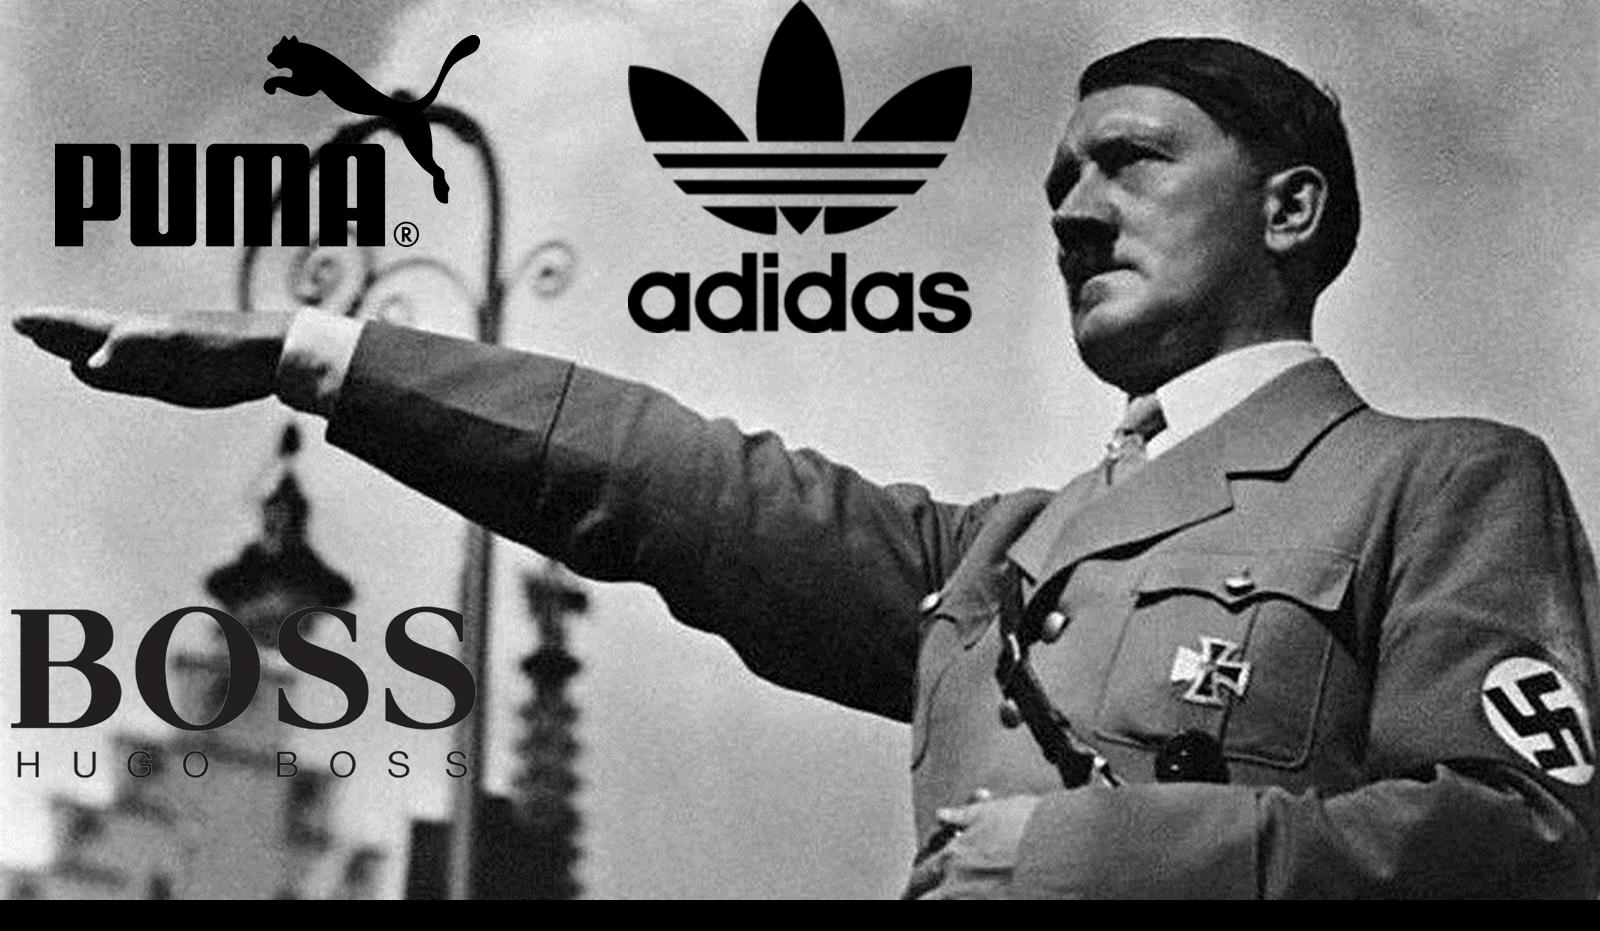 Extrêmement Misterios e historia: Adidas, PUMA, Hugo Boss y los nazis. ZX77